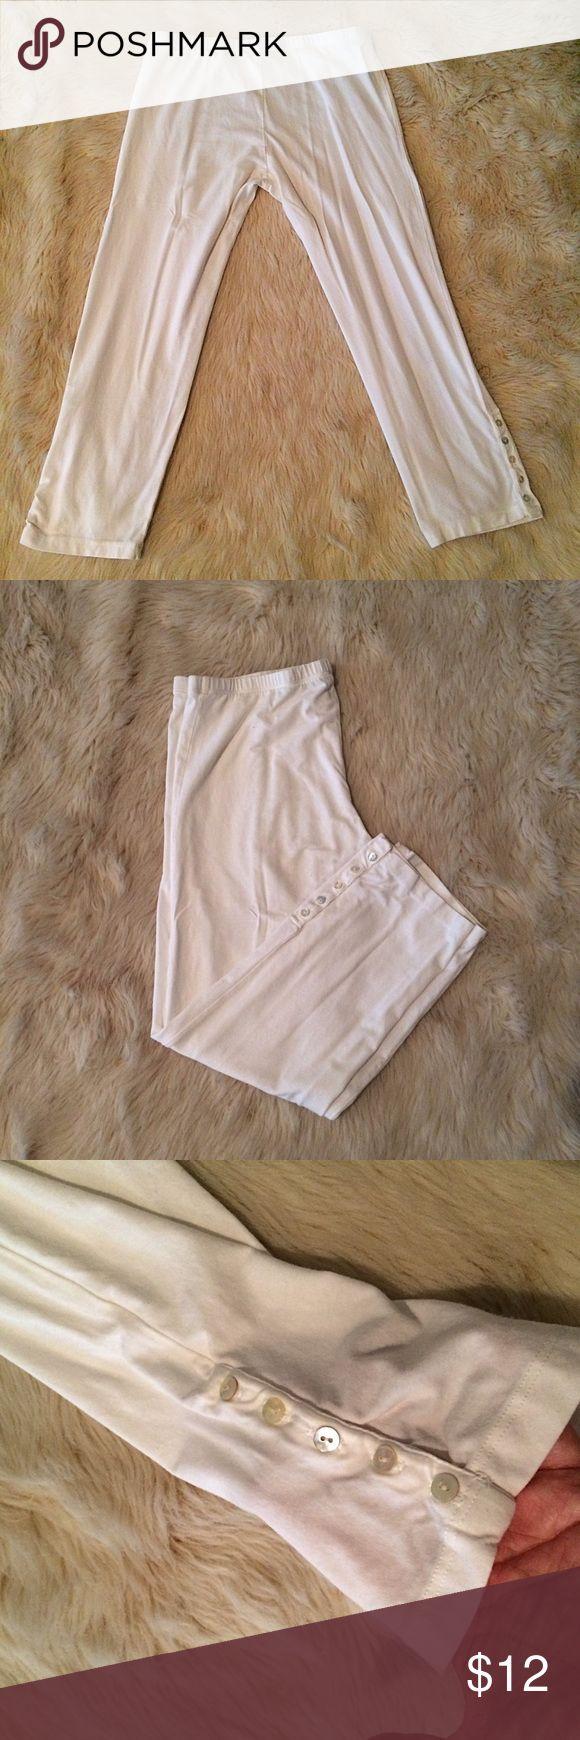 Splendid size L white Capri leggings with buttons Splendid size large white Capri leggings with button details. Super soft jersey knit. Outseam 27 1/2 inches, inseam 20 inches, waist 13 1/2 inches. 45% Pima cotton 45% modal 10% spandex Splendid Pants Leggings